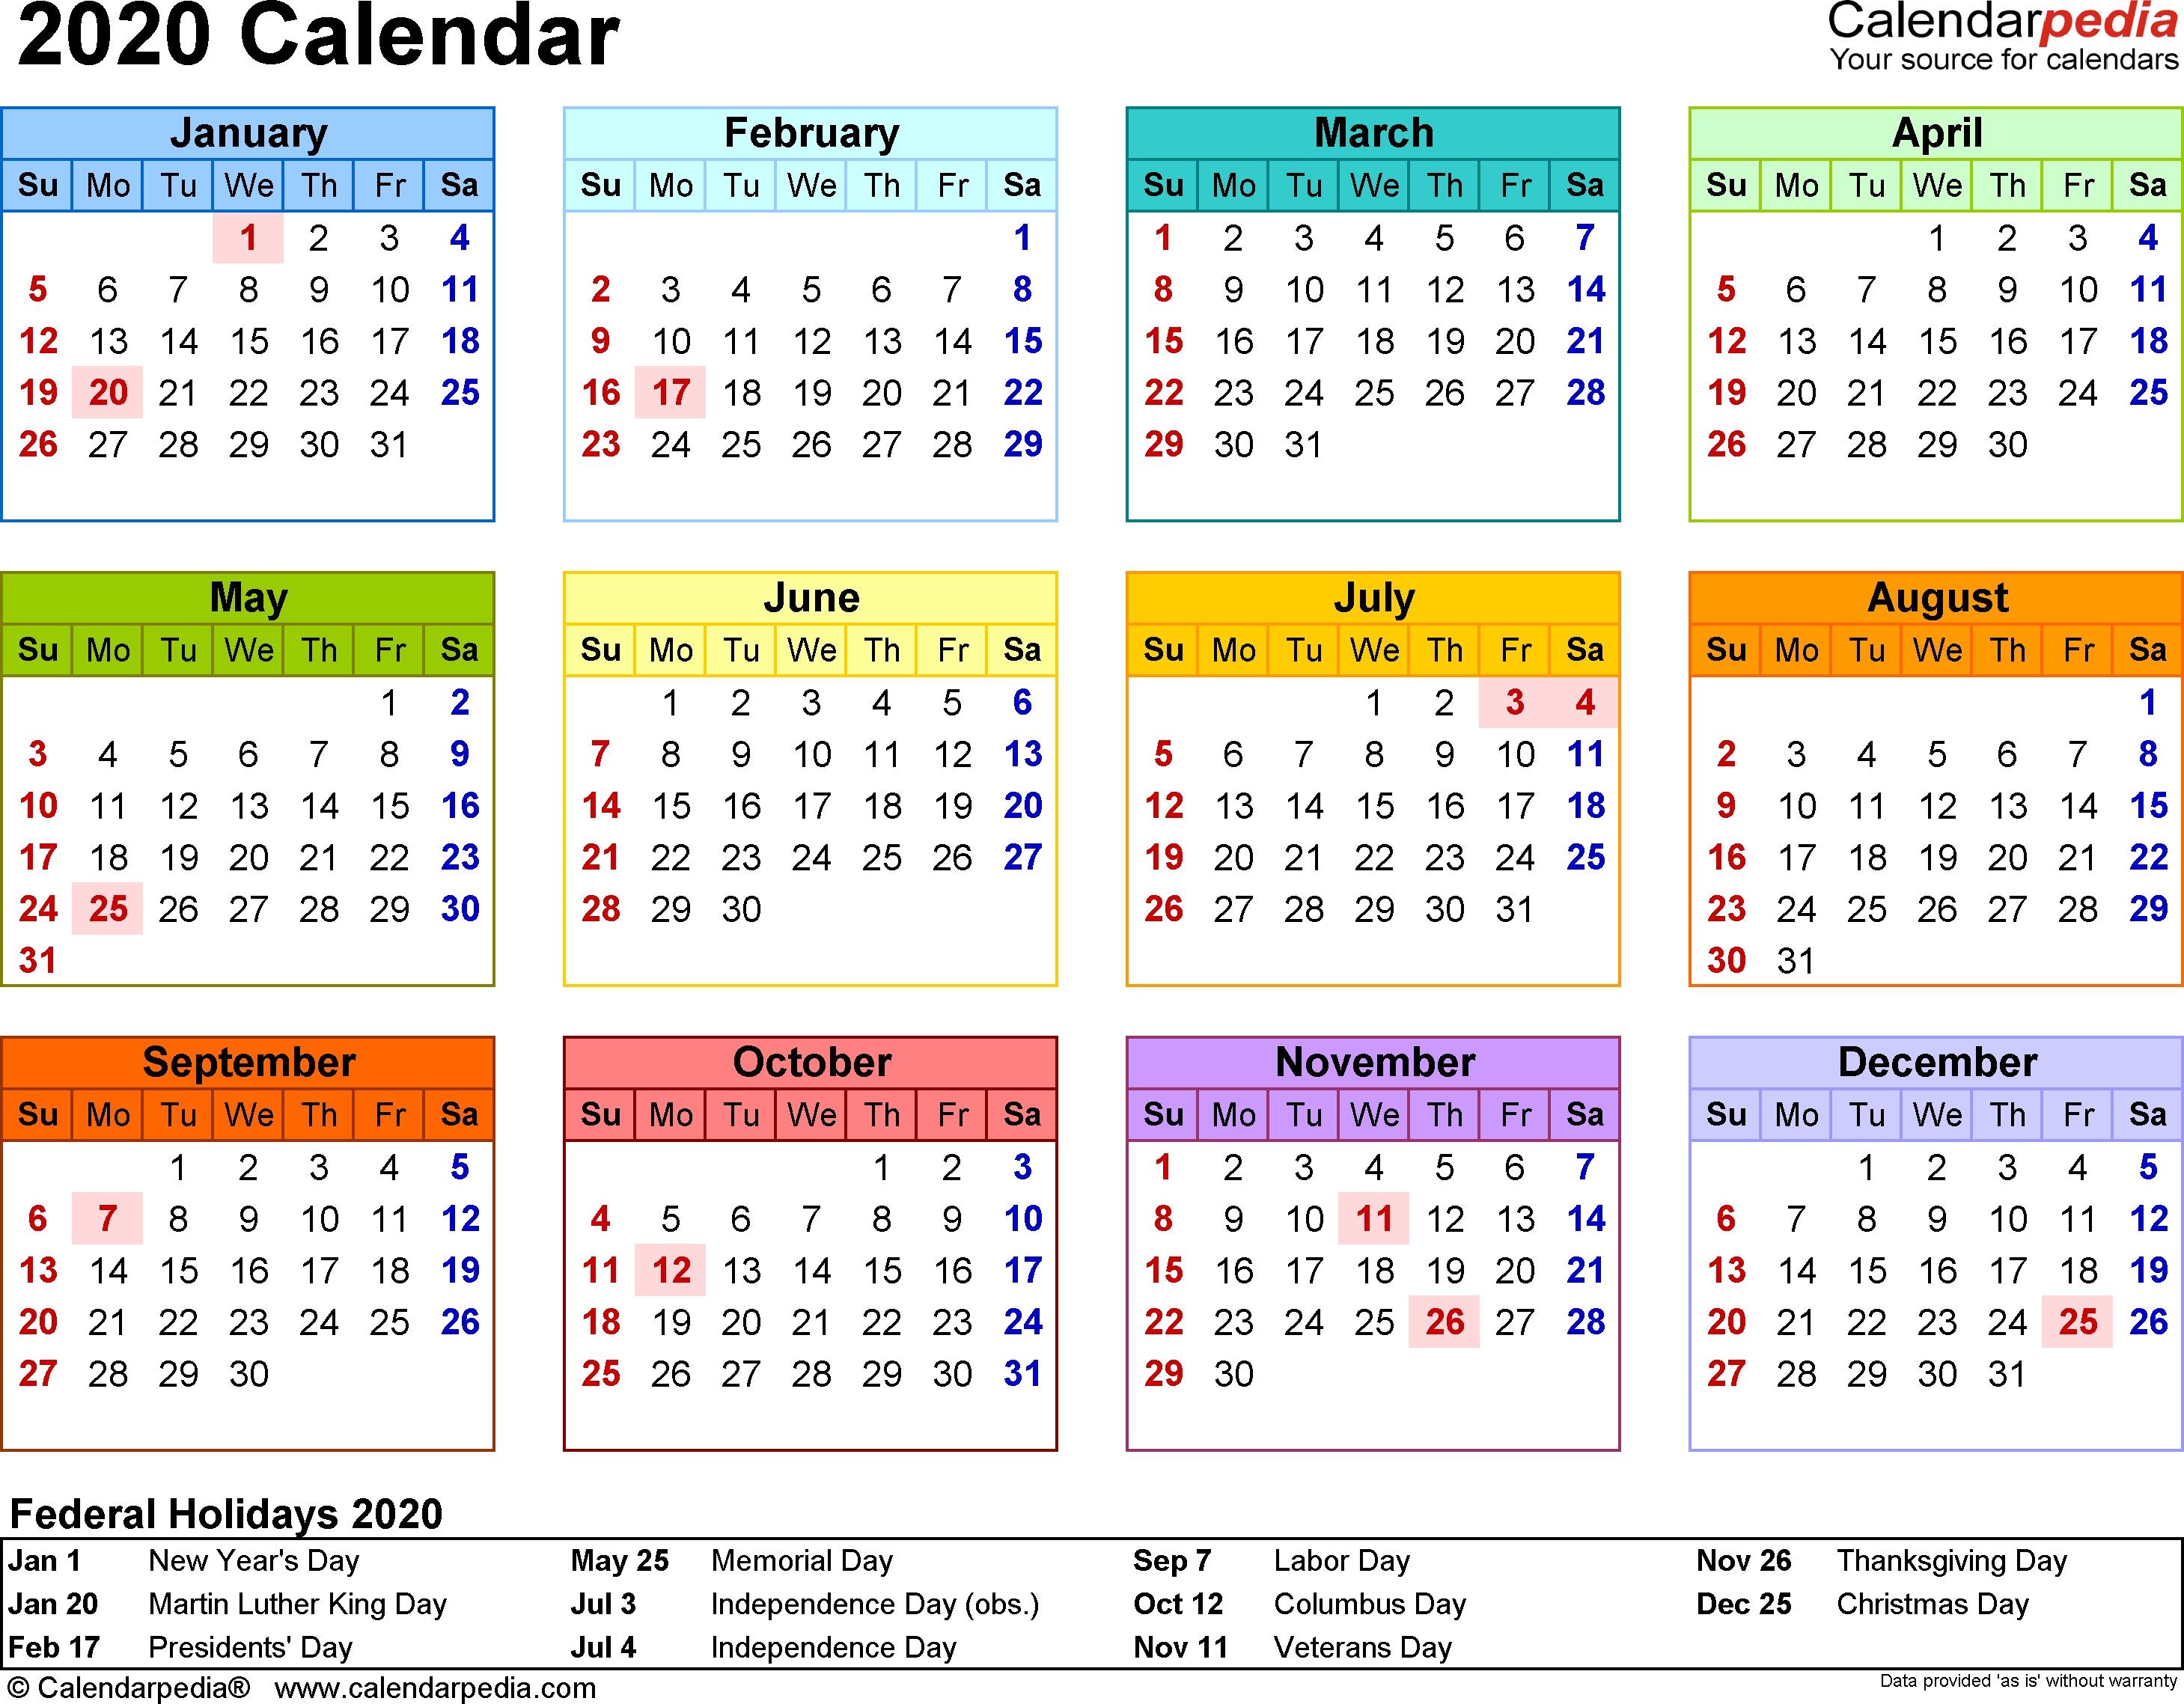 2020 Calendar - 18 Free Printable Word Calendar Templates-Free Printable Attendance Calendars 2020 Templates